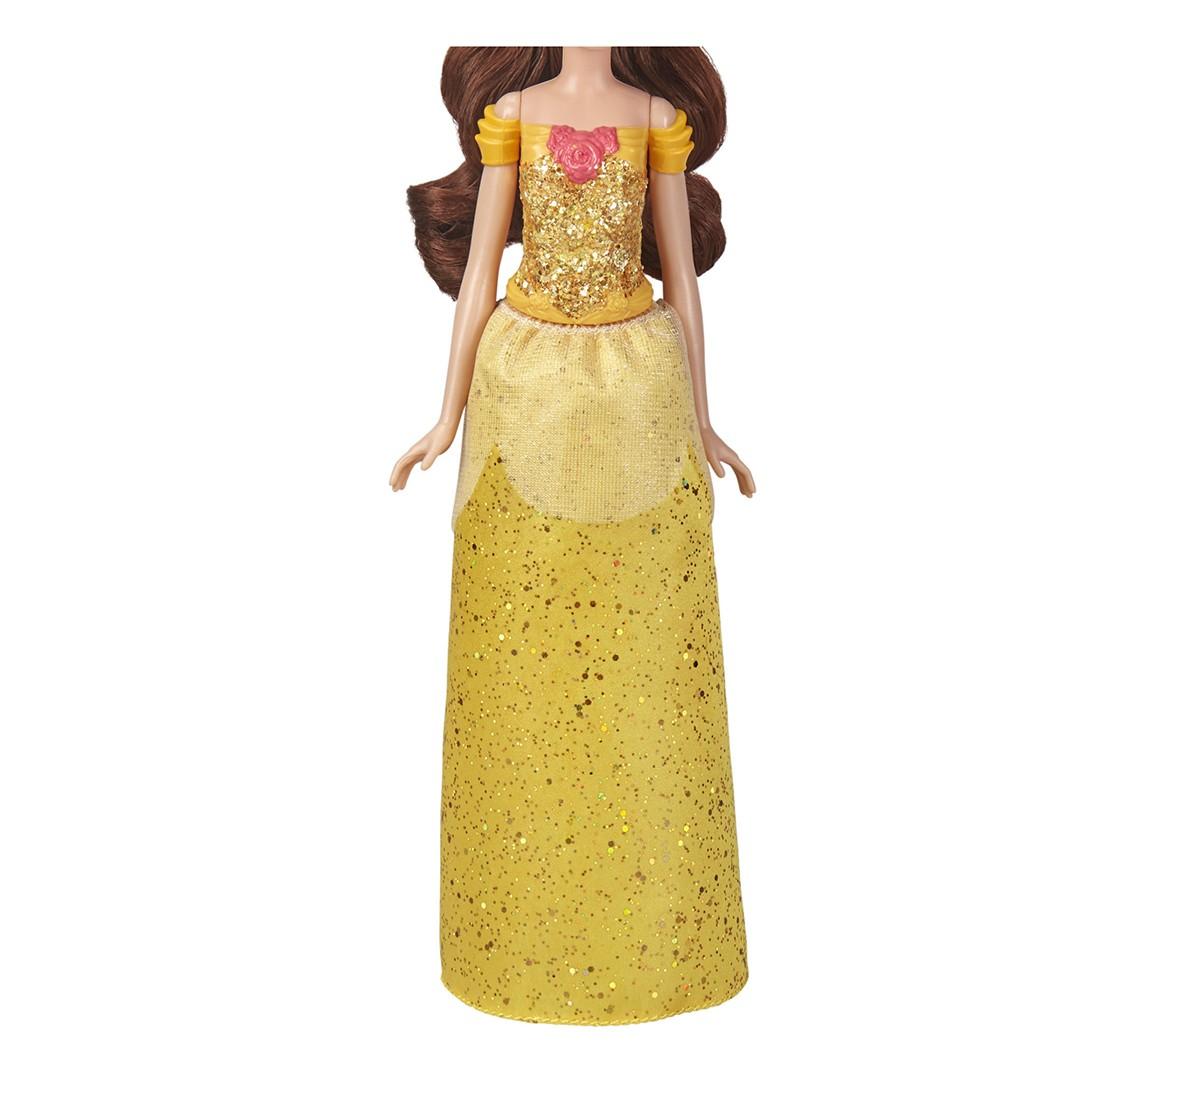 Disney Princess Royal Shimmer Belle Dolls & Accessories for Girls age 3Y+